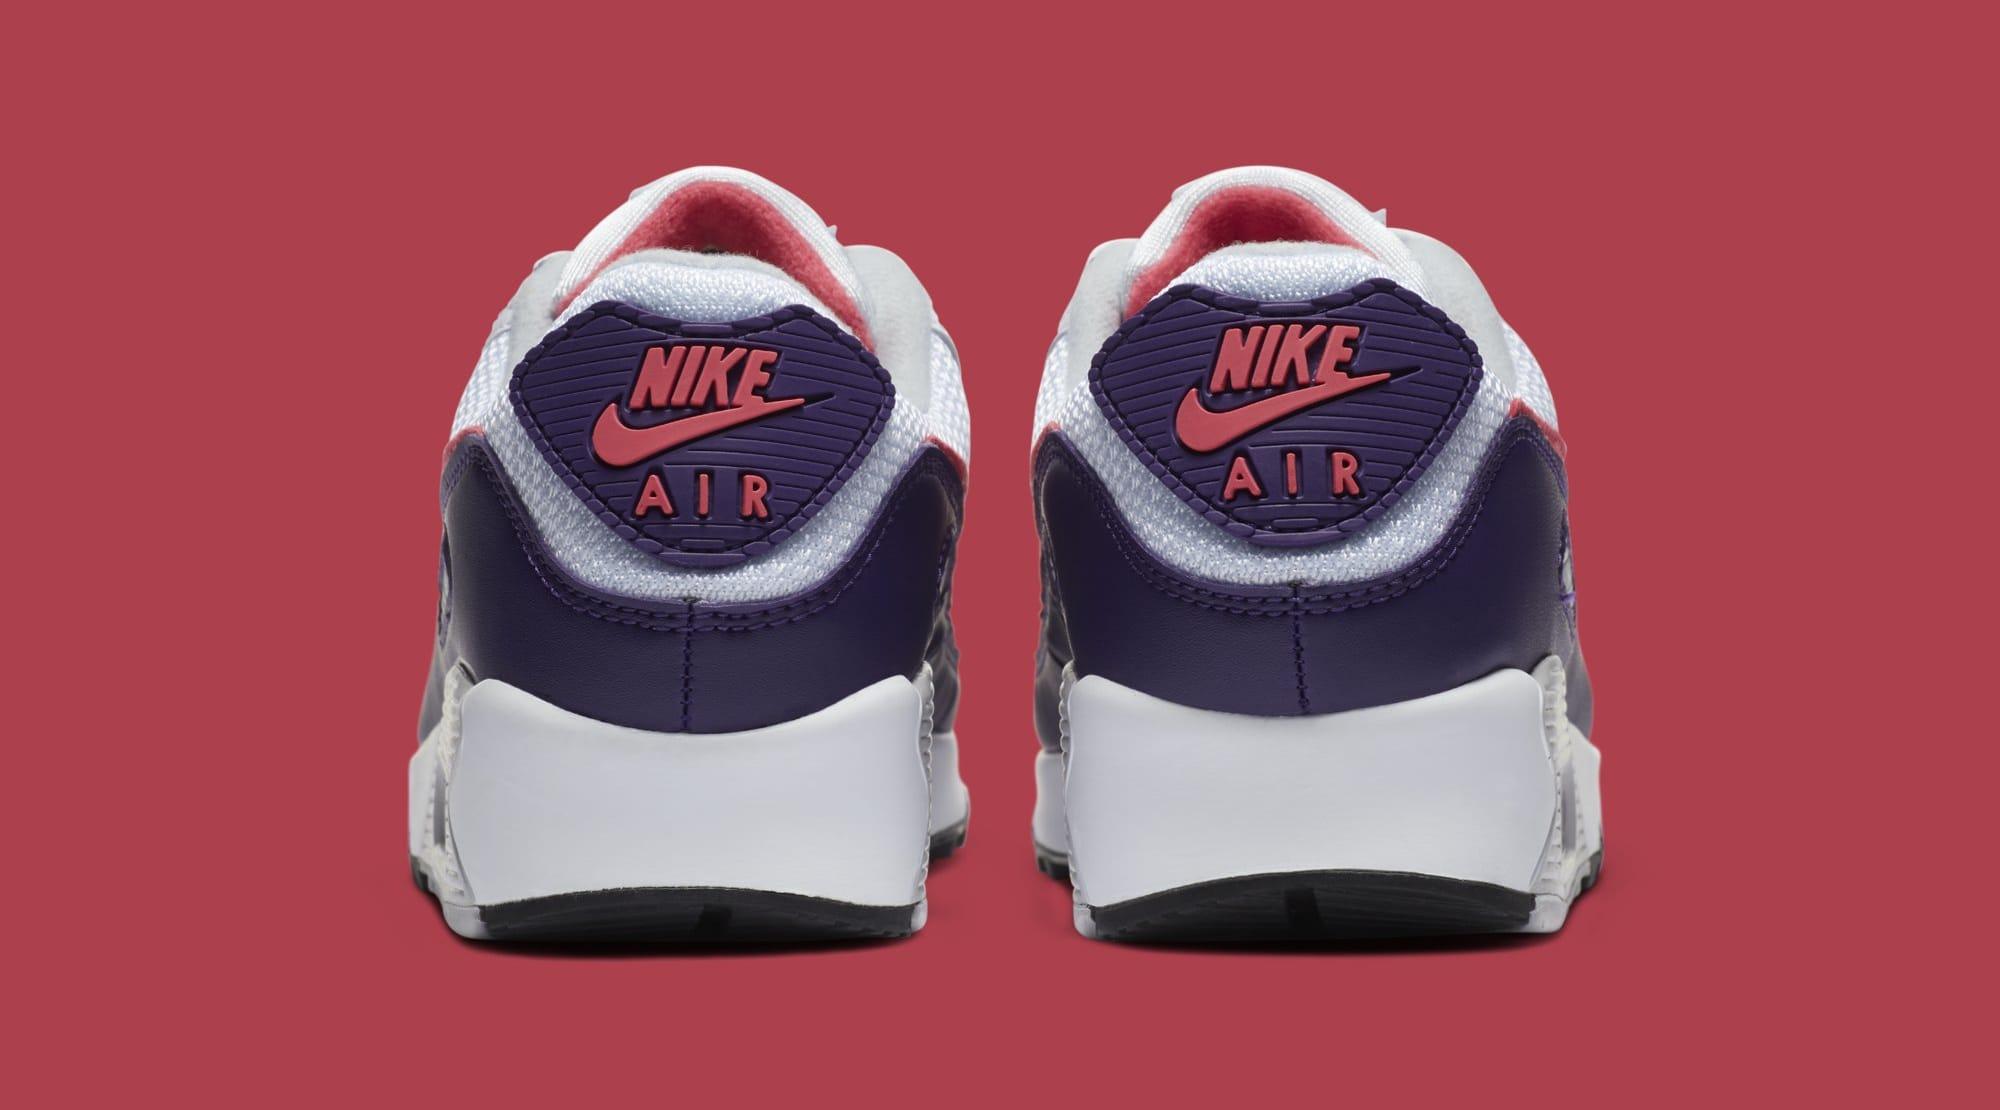 Nike Air Max 90 Women's 'Eggplant' CW1360-100 Heel